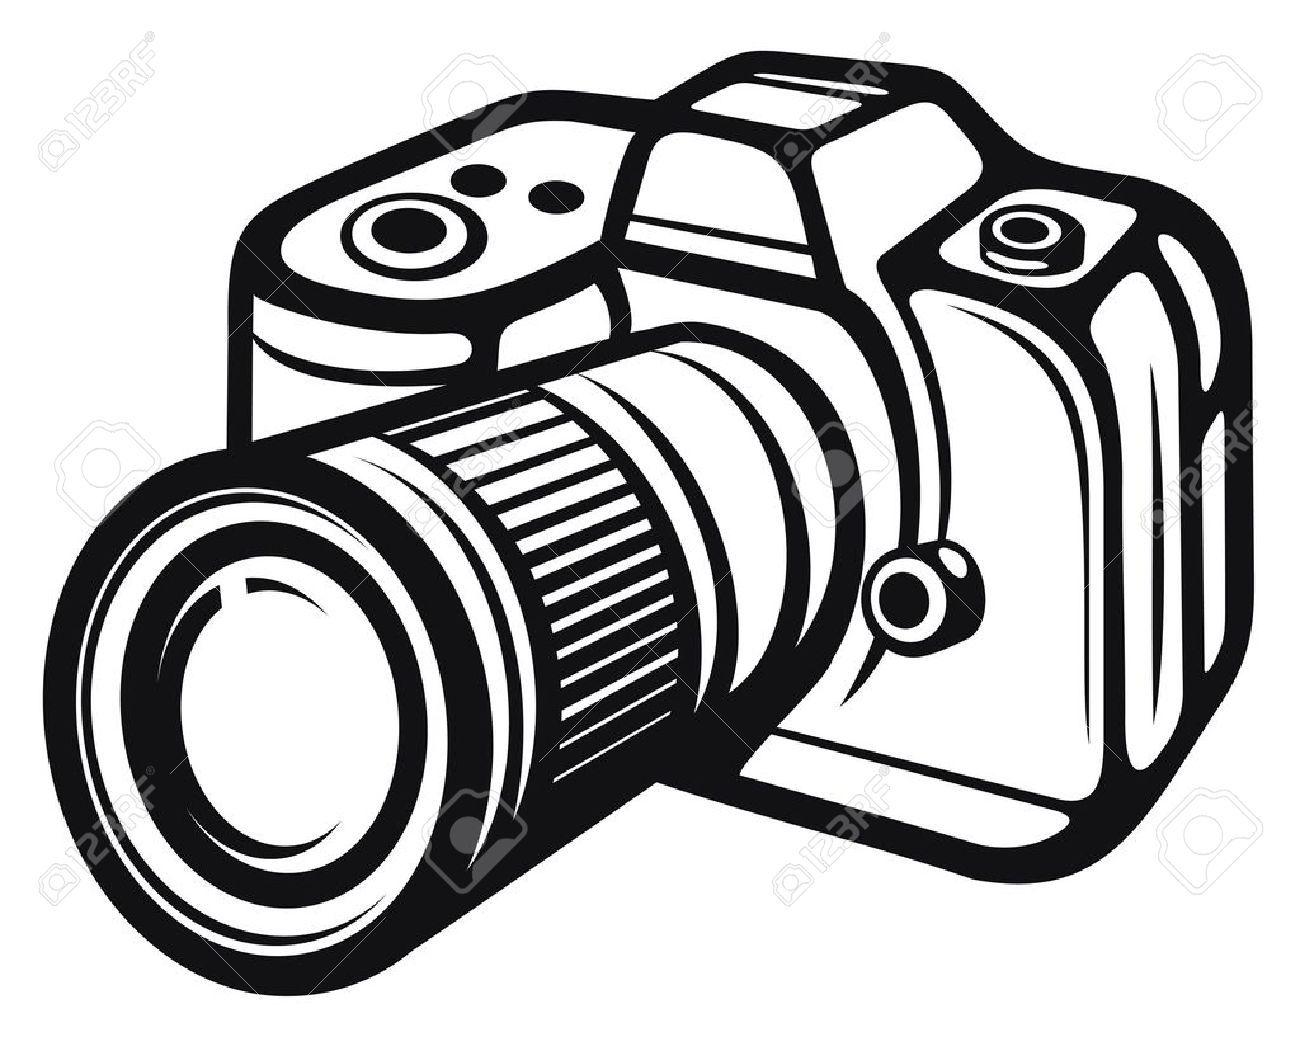 Stock Photo Camera clip art, Digital camera, Camera drawing